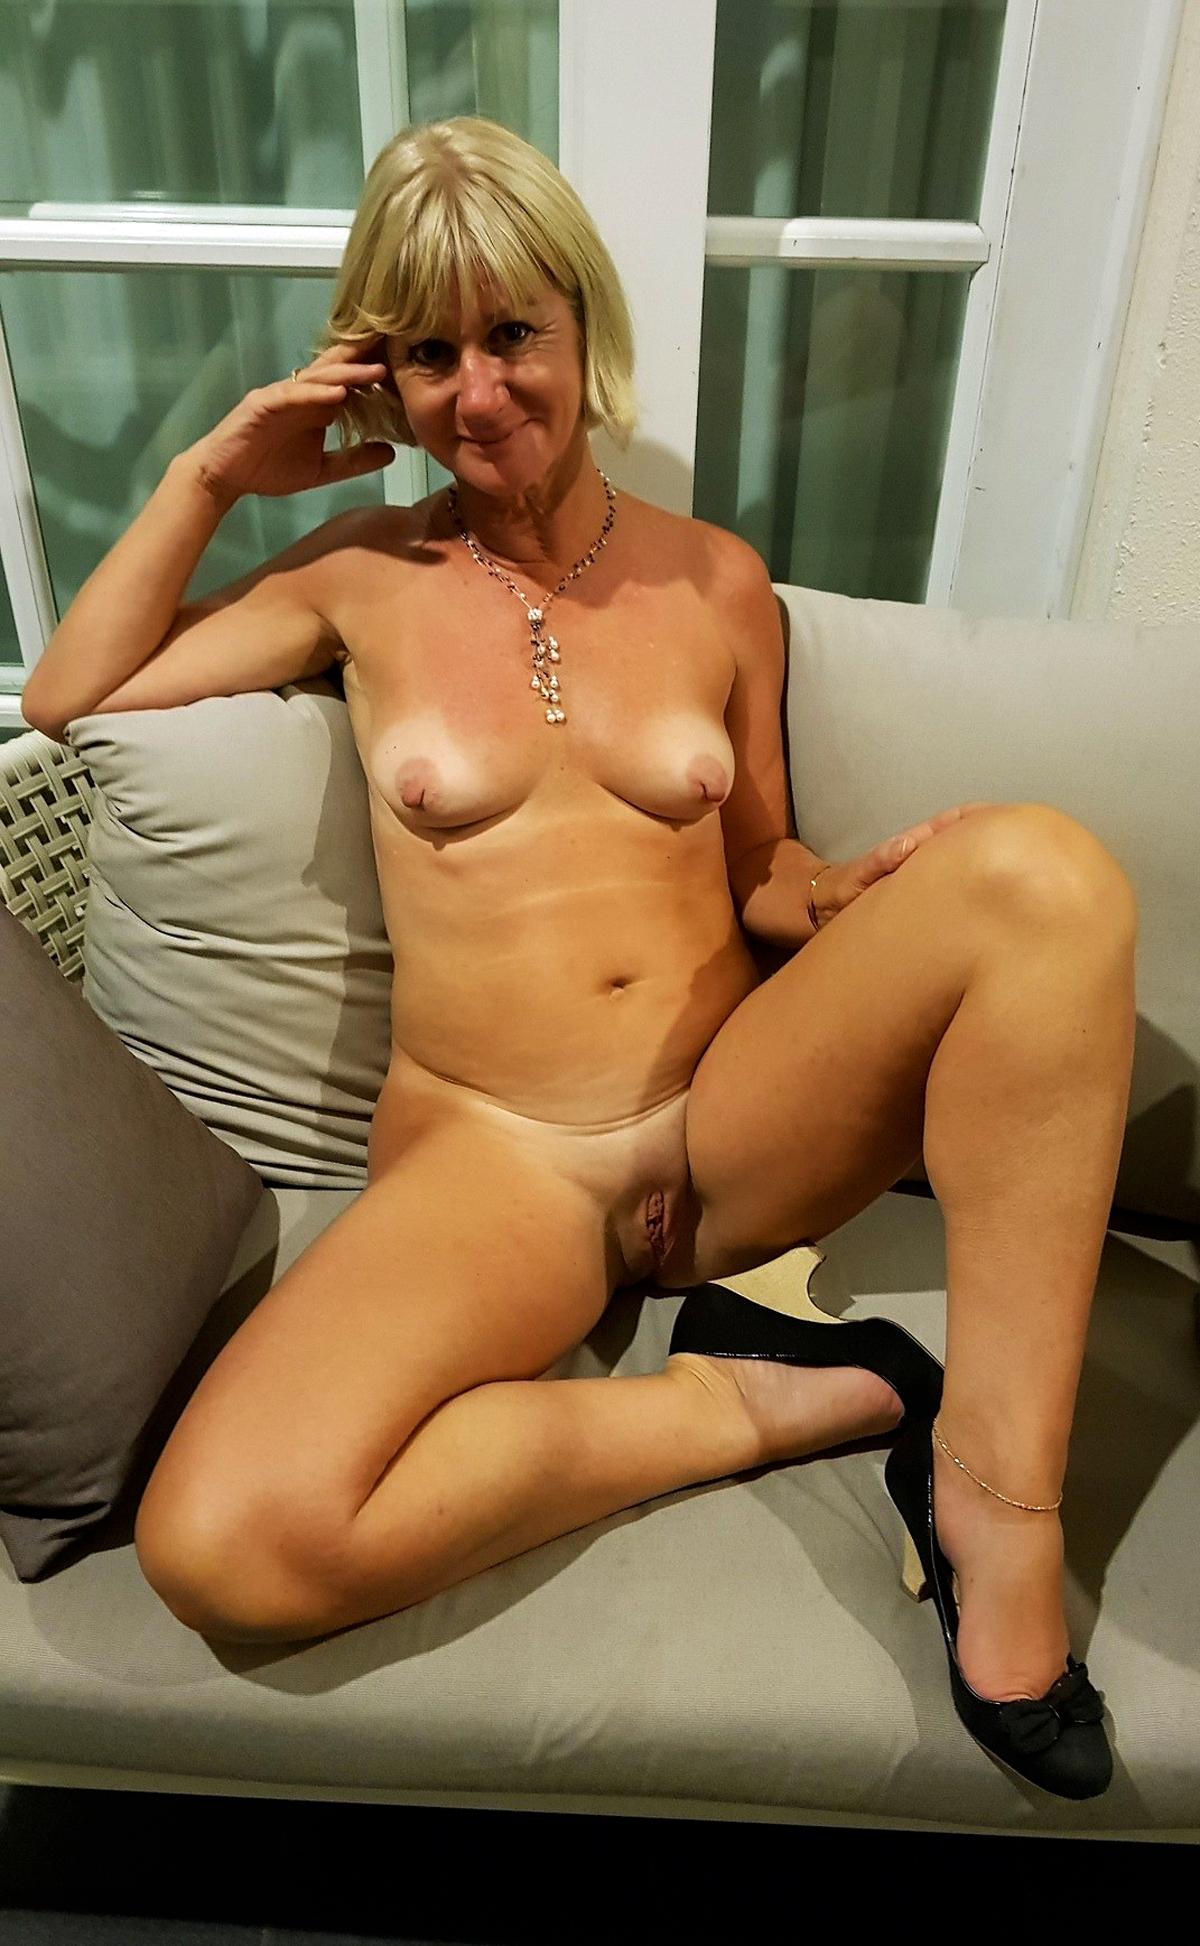 sweet blonde blowjob